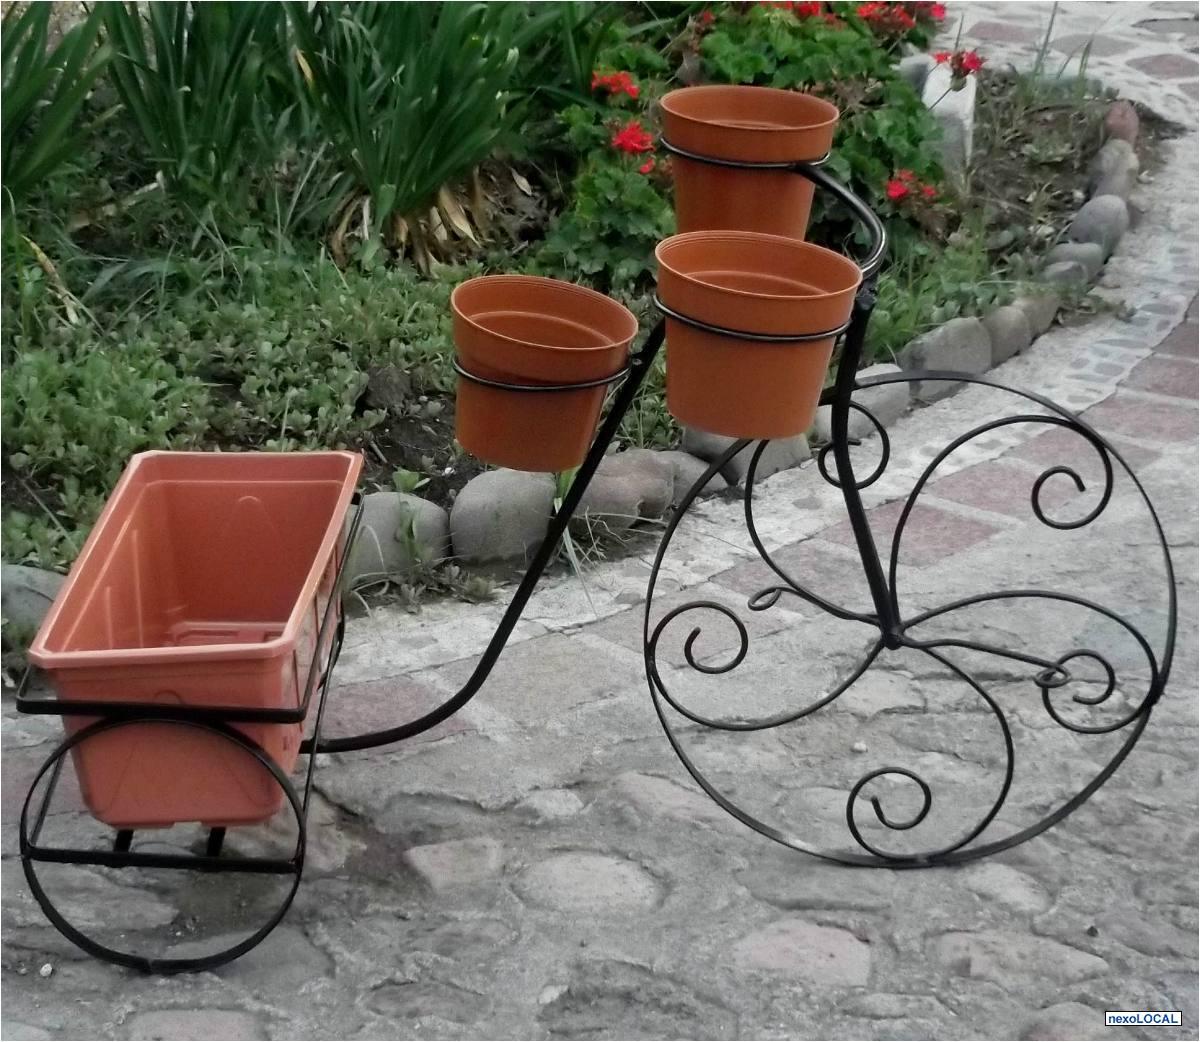 Porta maceteros en fierro forjado fierro forjado chile for Bancas para jardin de herreria